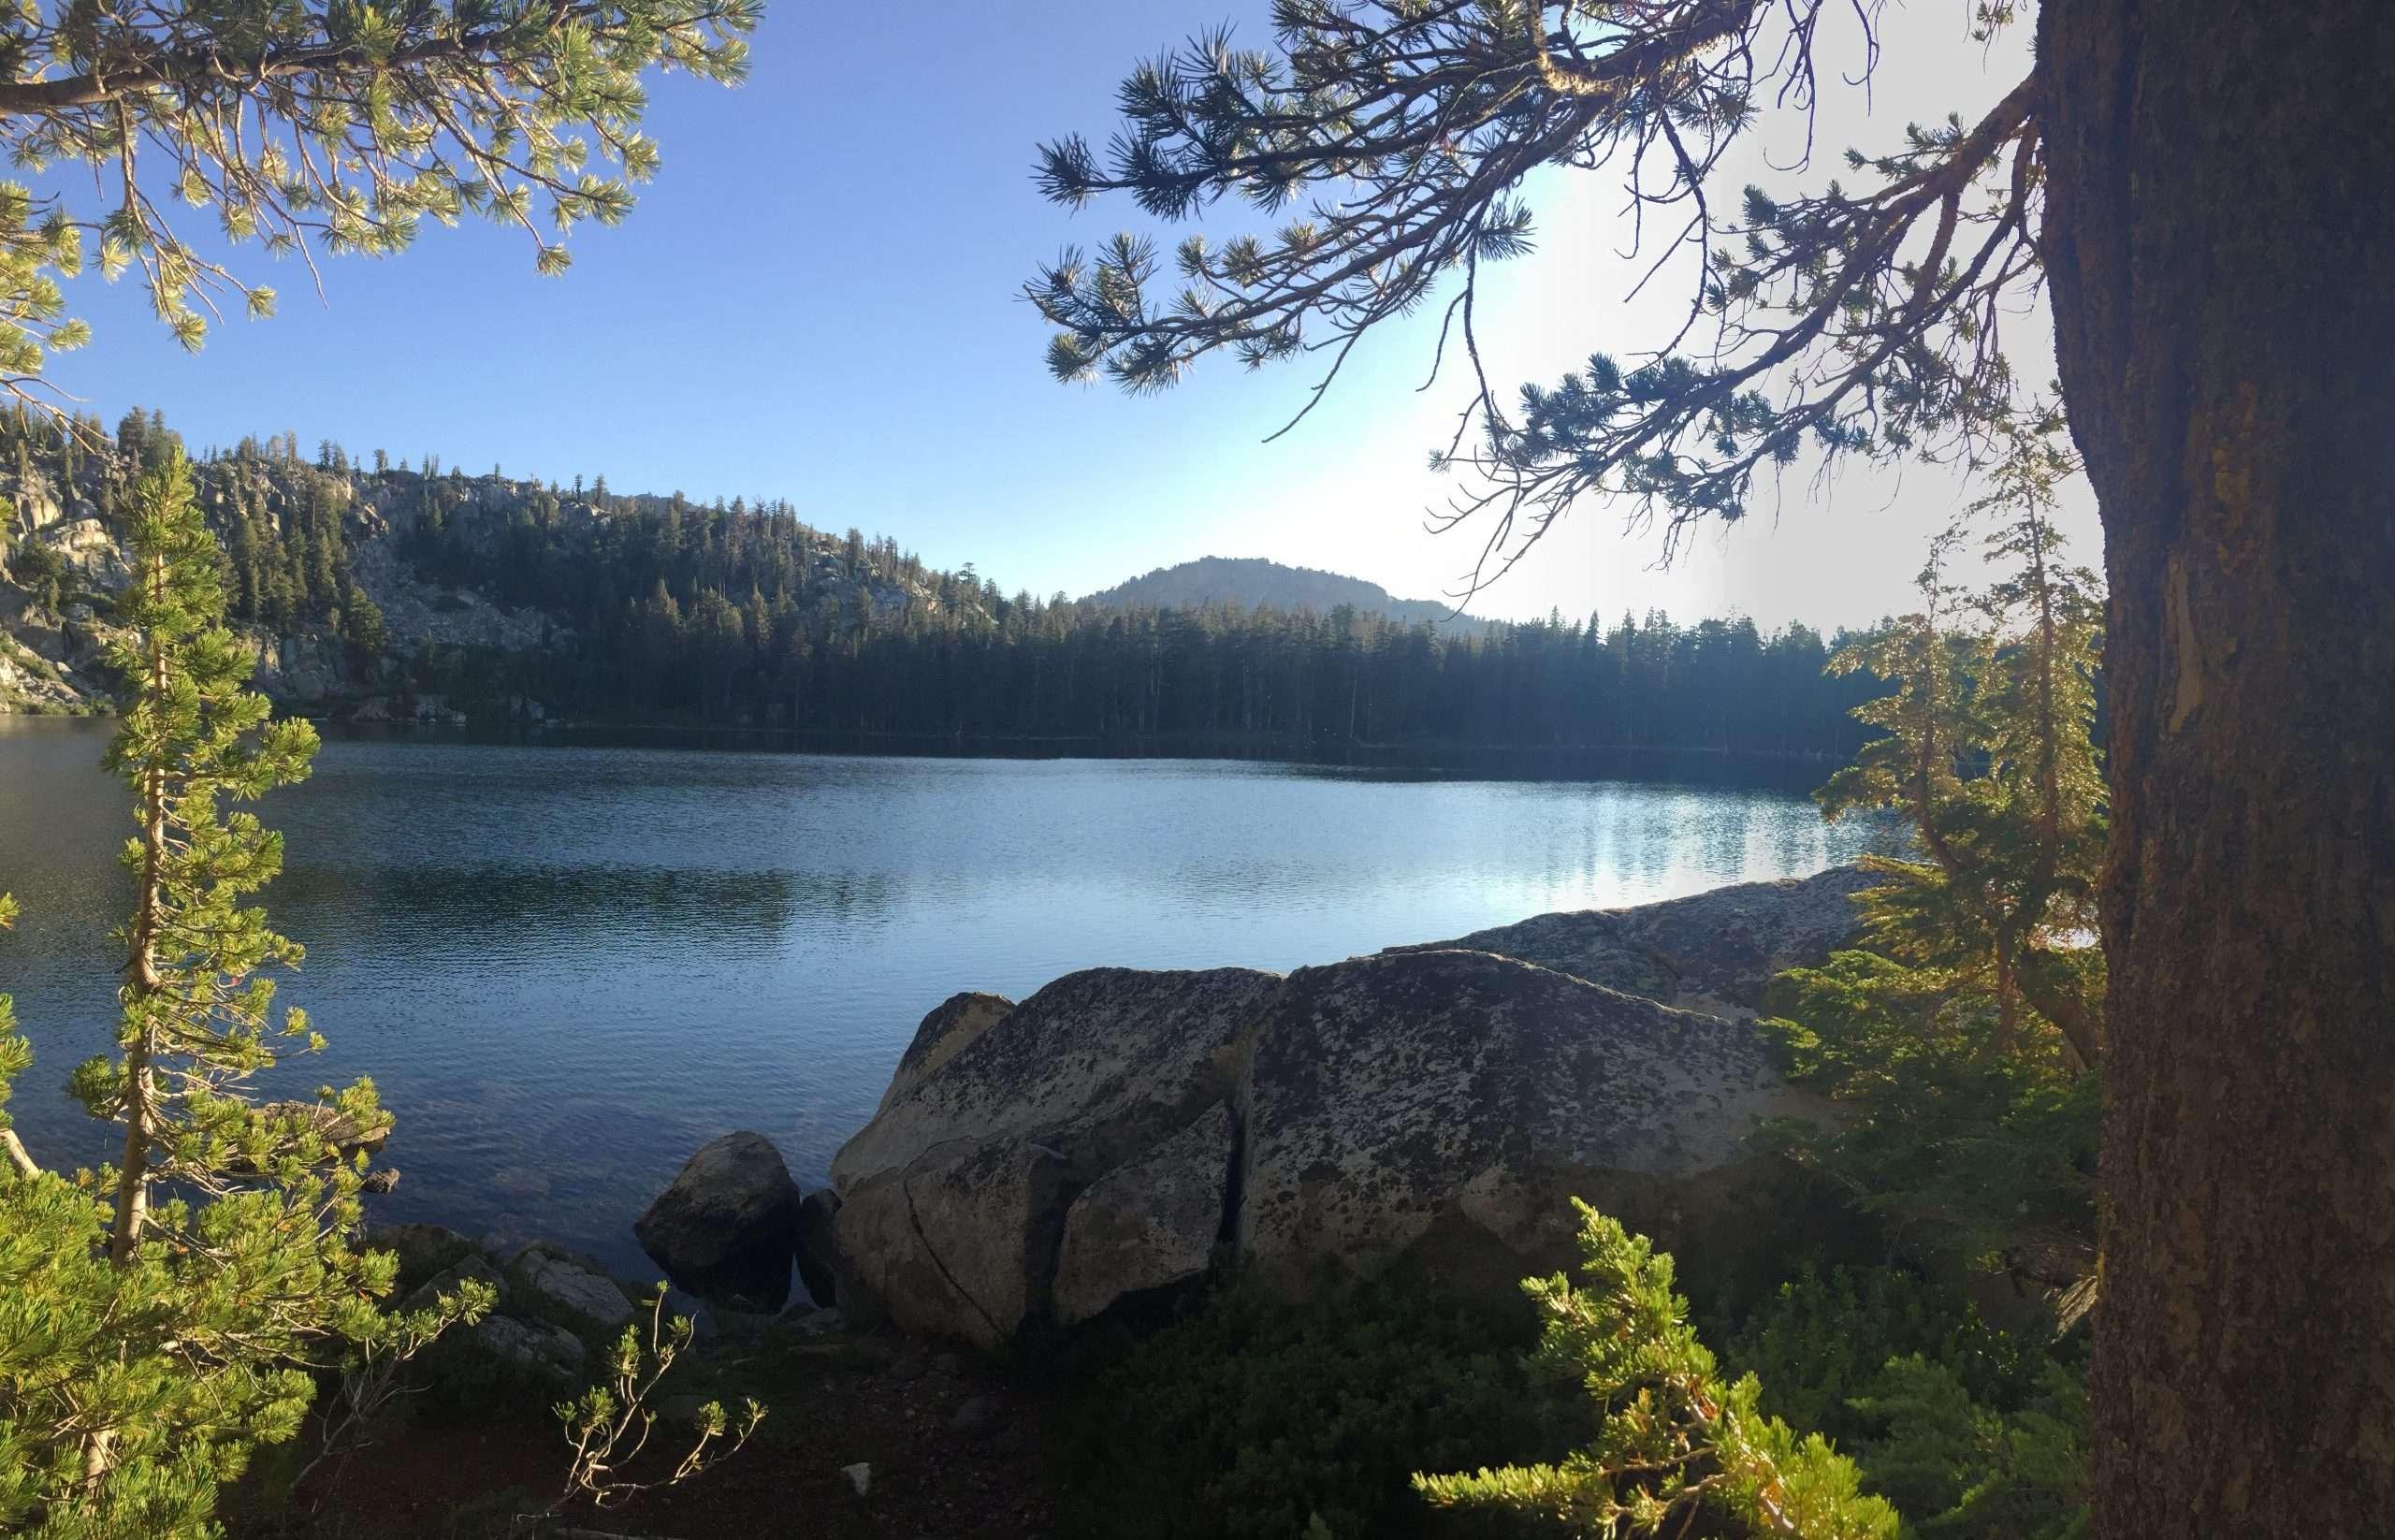 Second Day, Sunrise Lake